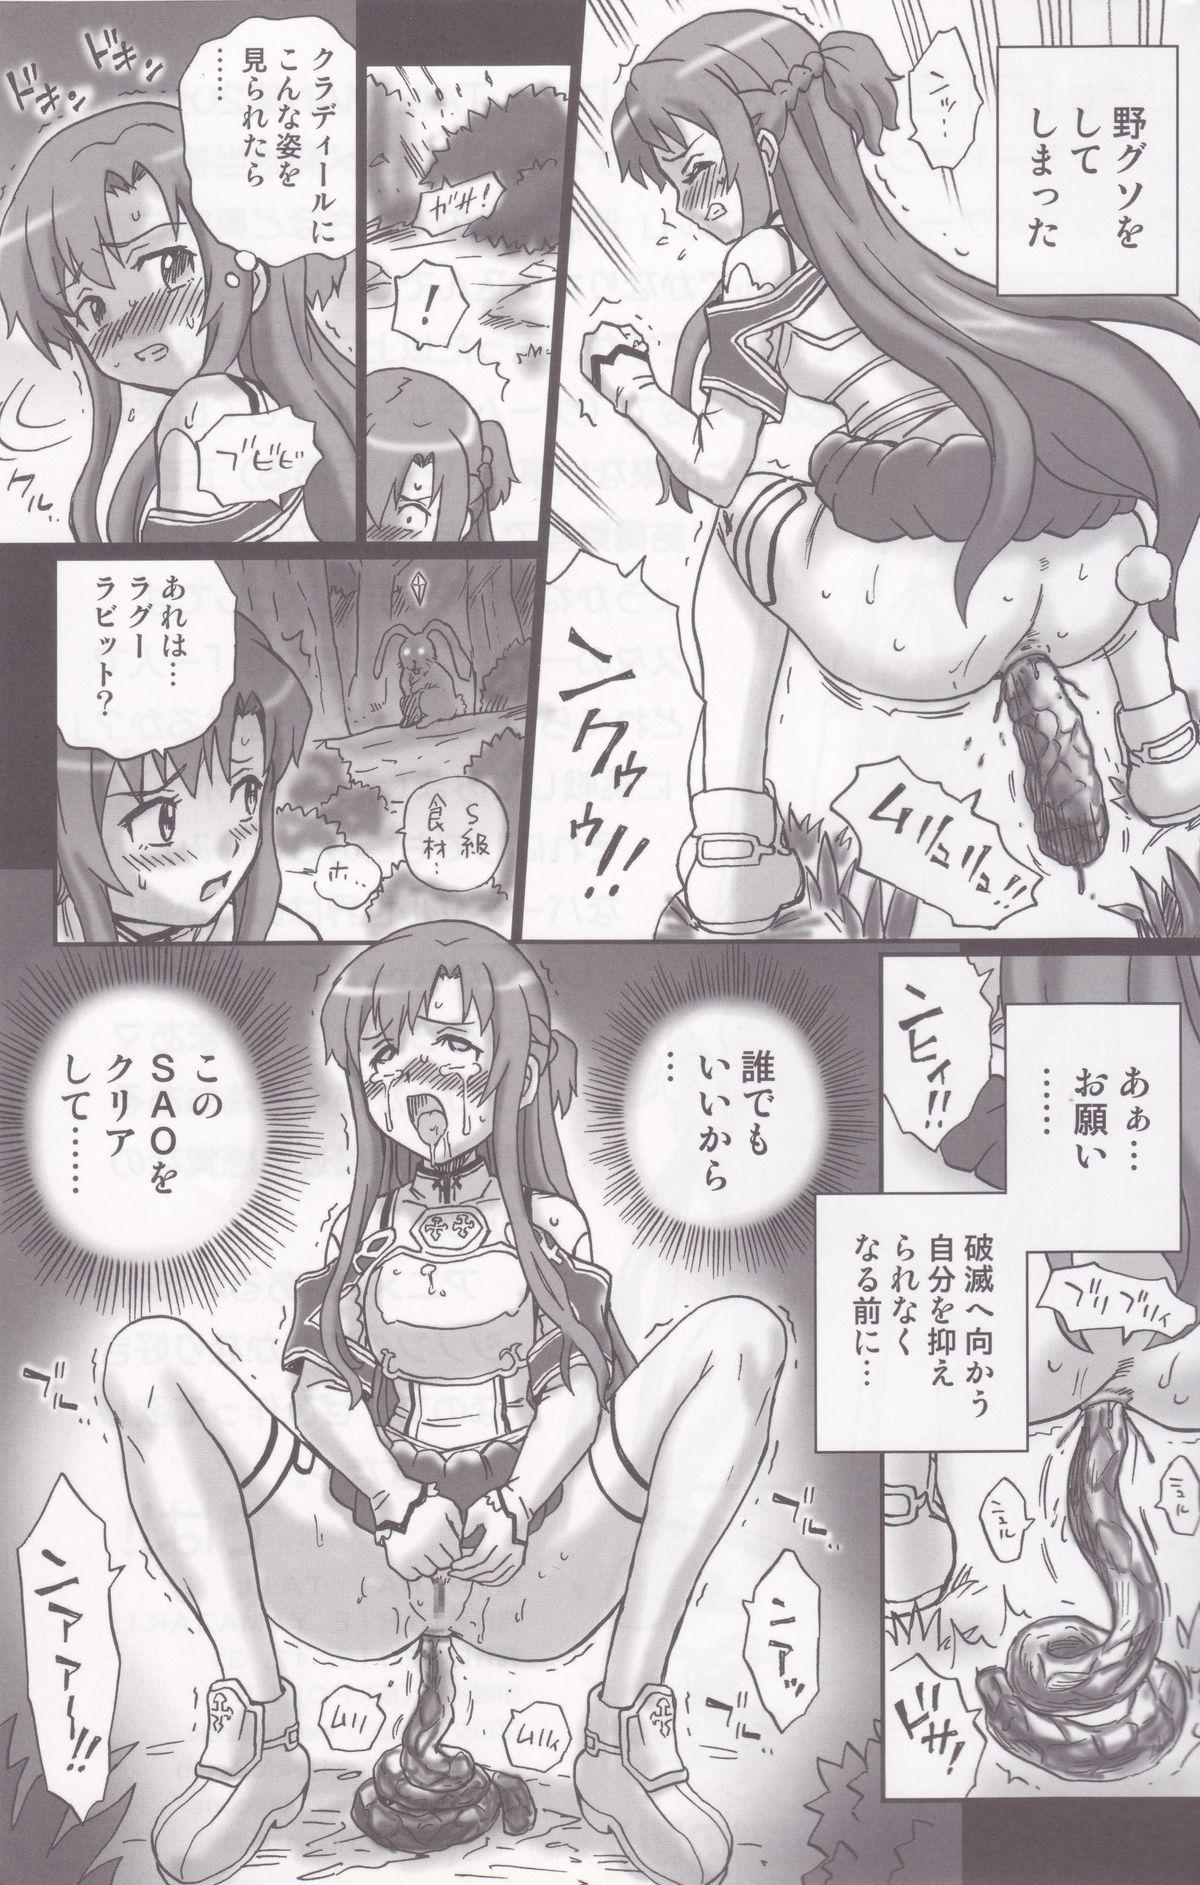 TAIL-MAN ASUNA BOOK 31